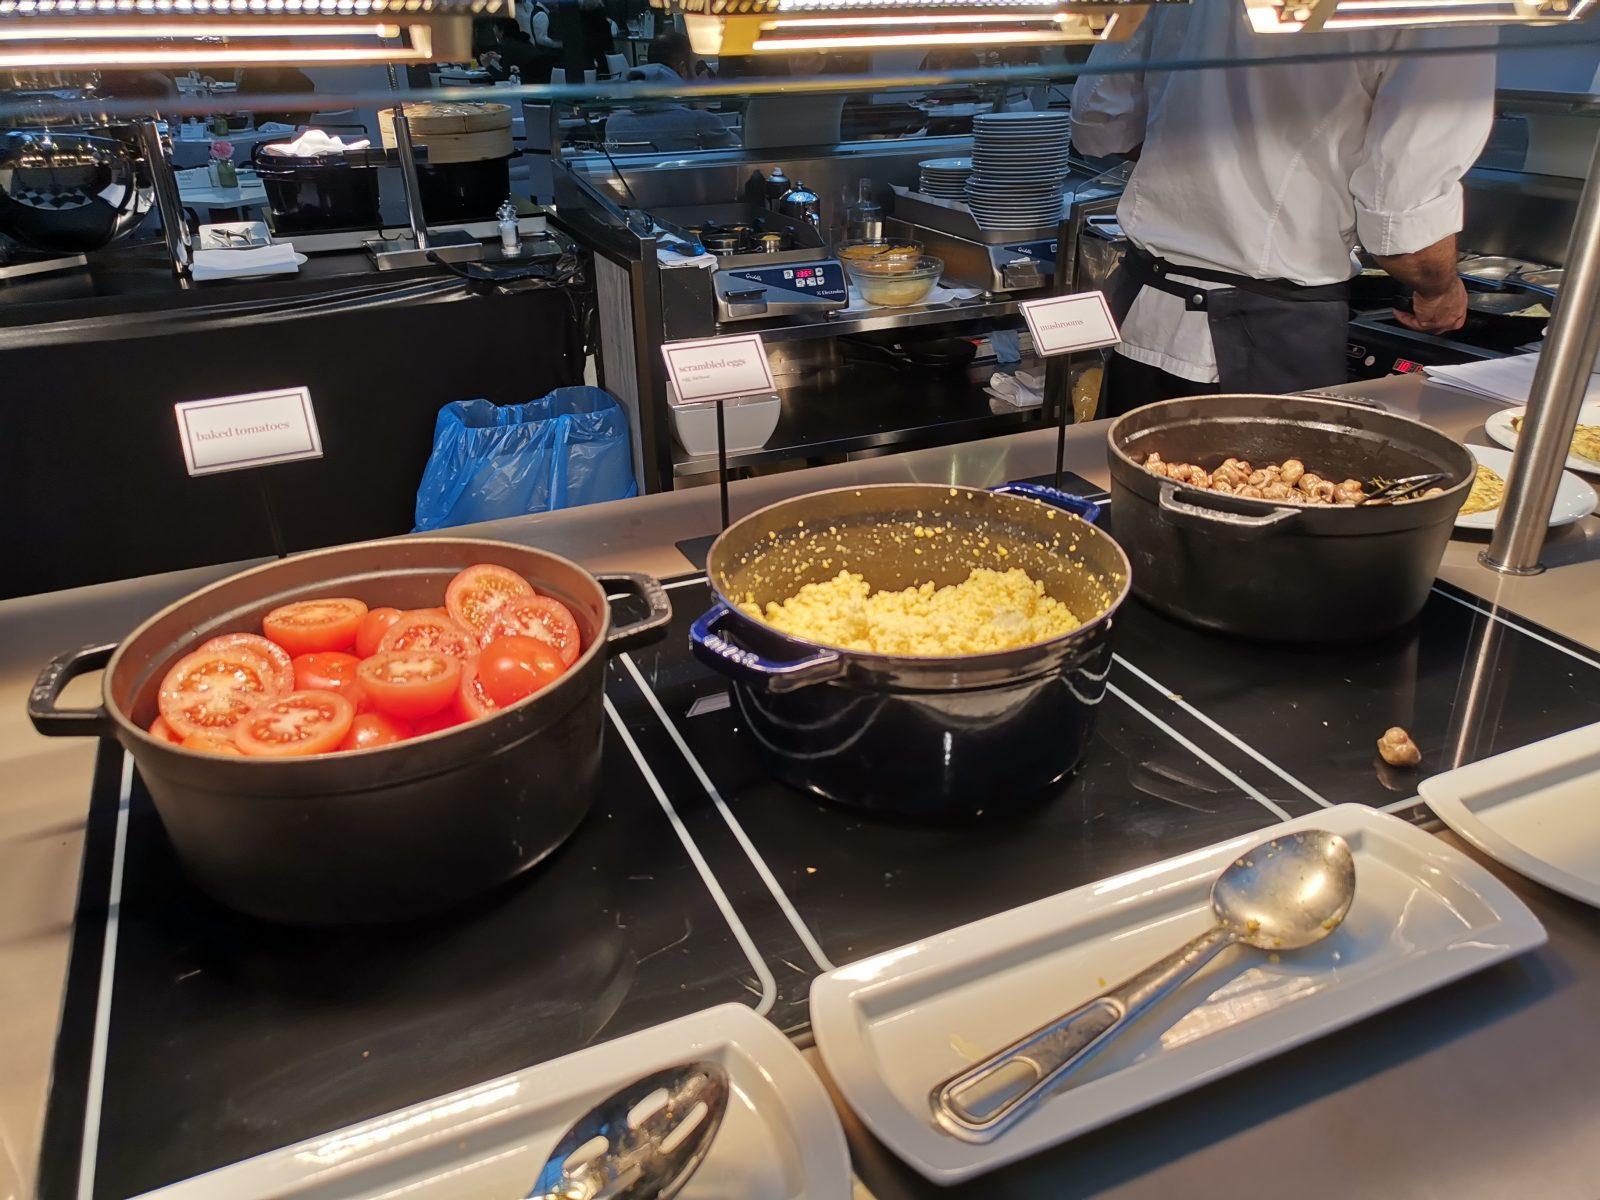 NH コレクション アムステルダム グランド ホテル クラスナポルスキーの朝食(トマト、スクランブルエッグ、マッシュルーム)